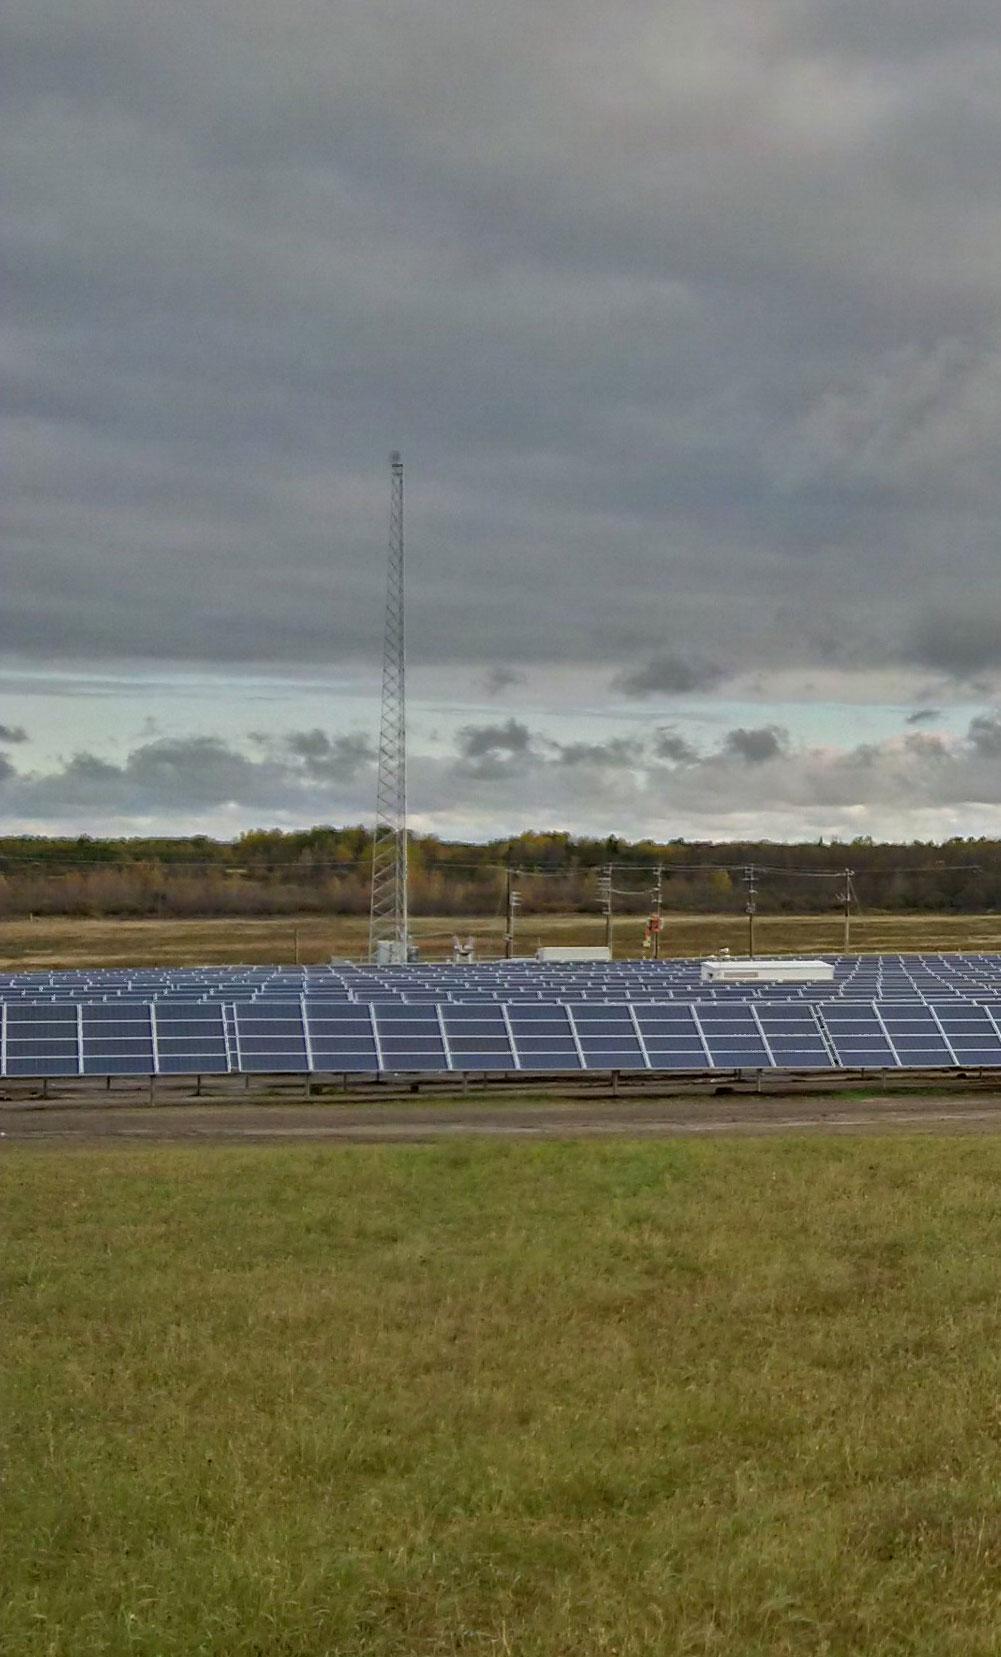 solar panels transmission lines to Honi grid